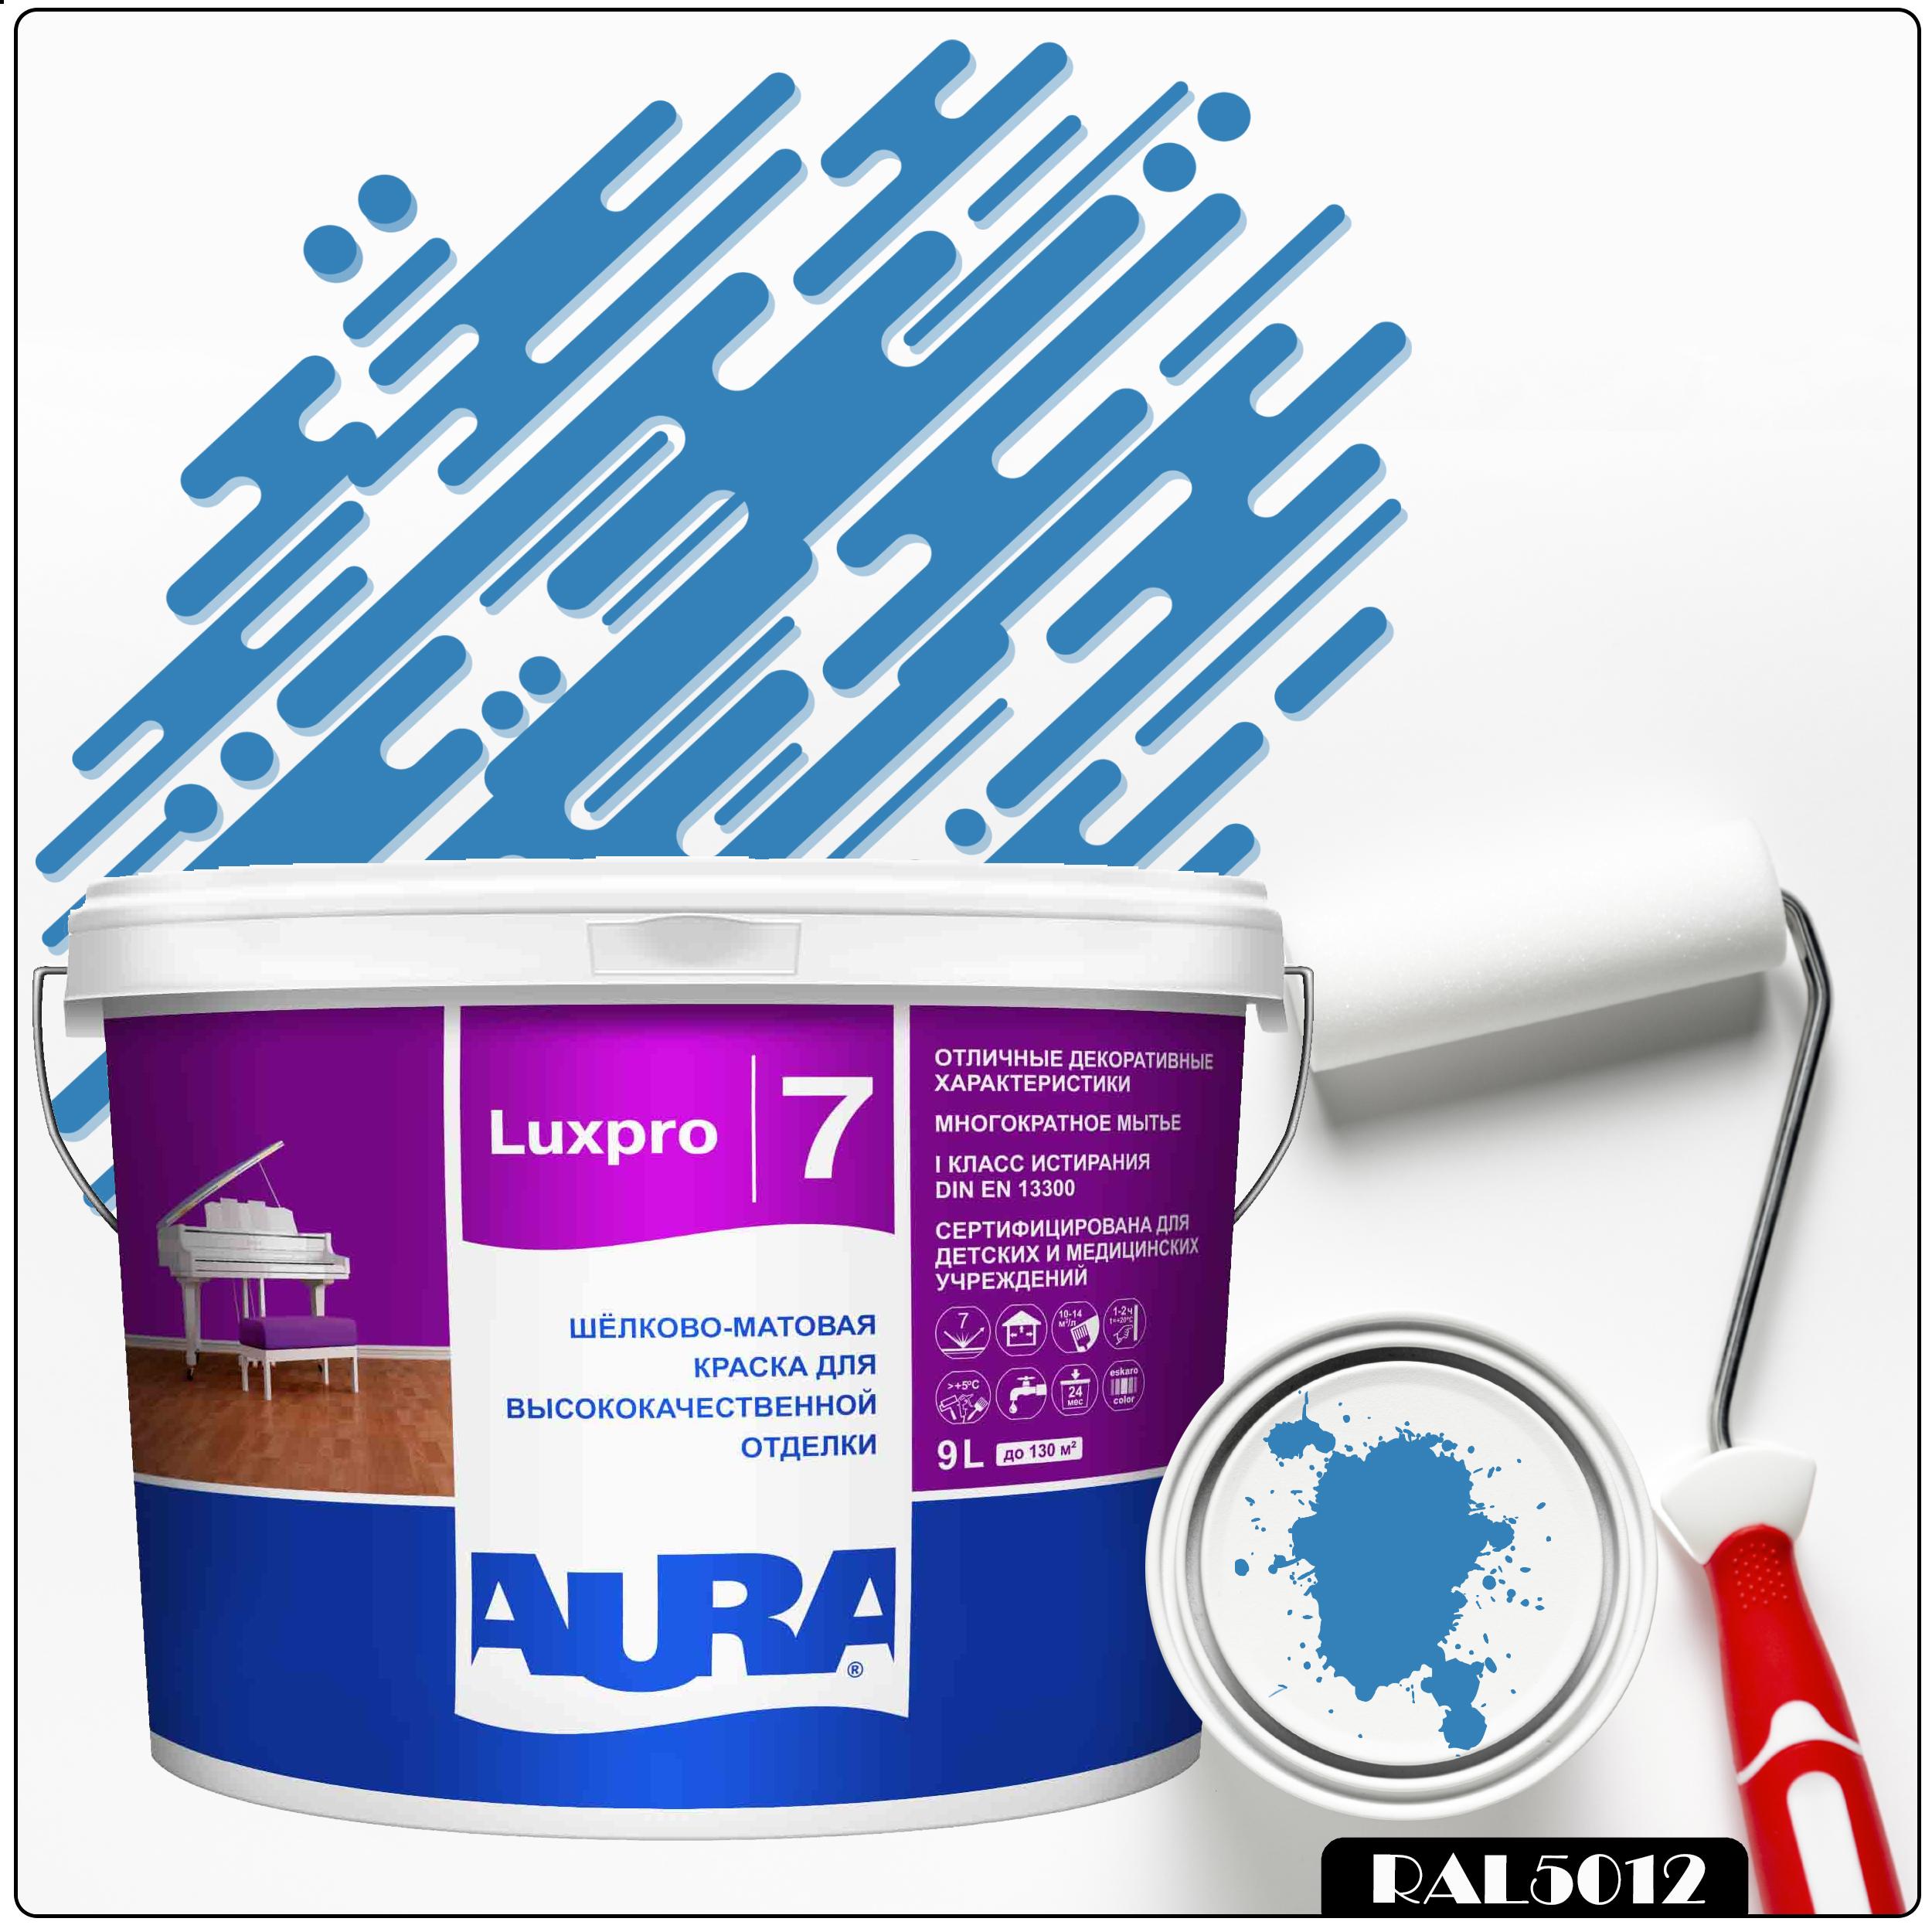 Фото 12 - Краска Aura LuxPRO 7, RAL 5012 Голубой, латексная, шелково-матовая, интерьерная, 9л, Аура.